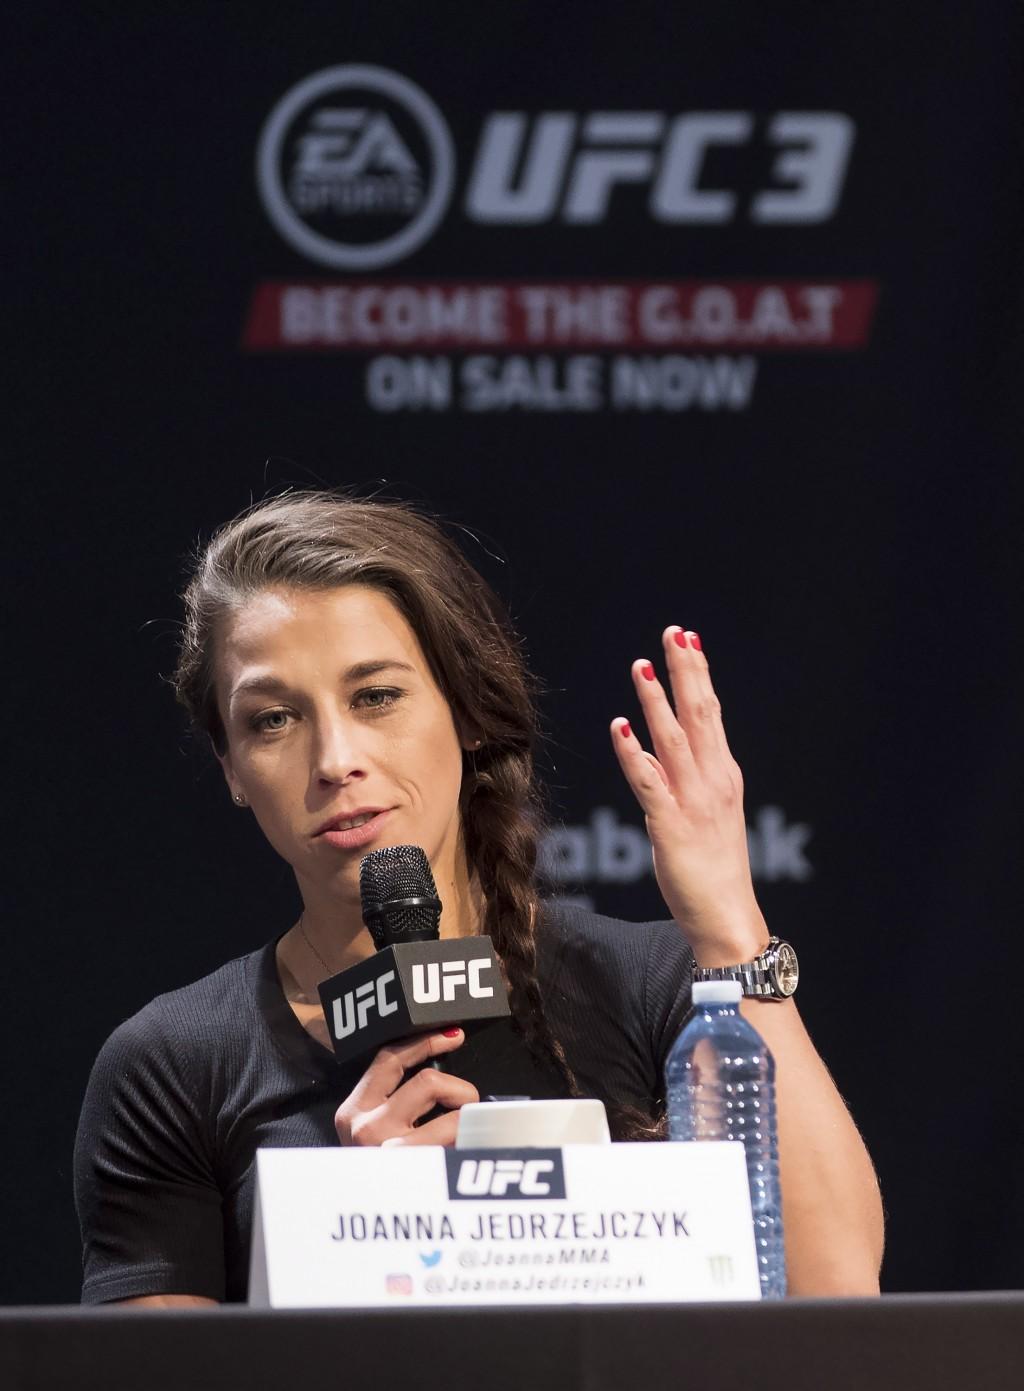 UFC women's strawweight Joanna Jedrzejczyk speaks at a press conference, Wednesday, Dec. 5, 2018 in Toronto. UFC 231 takes place on Saturday, Dec. 8,